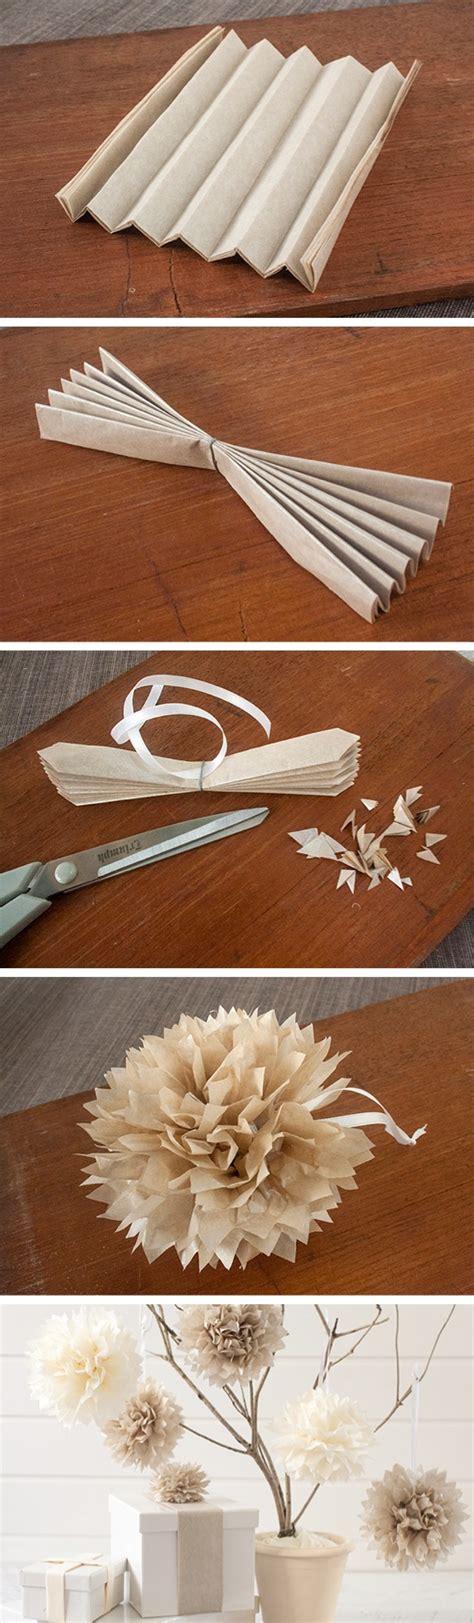 easy tissue paper crafts easy diy tissue paper pom poms craft by photo